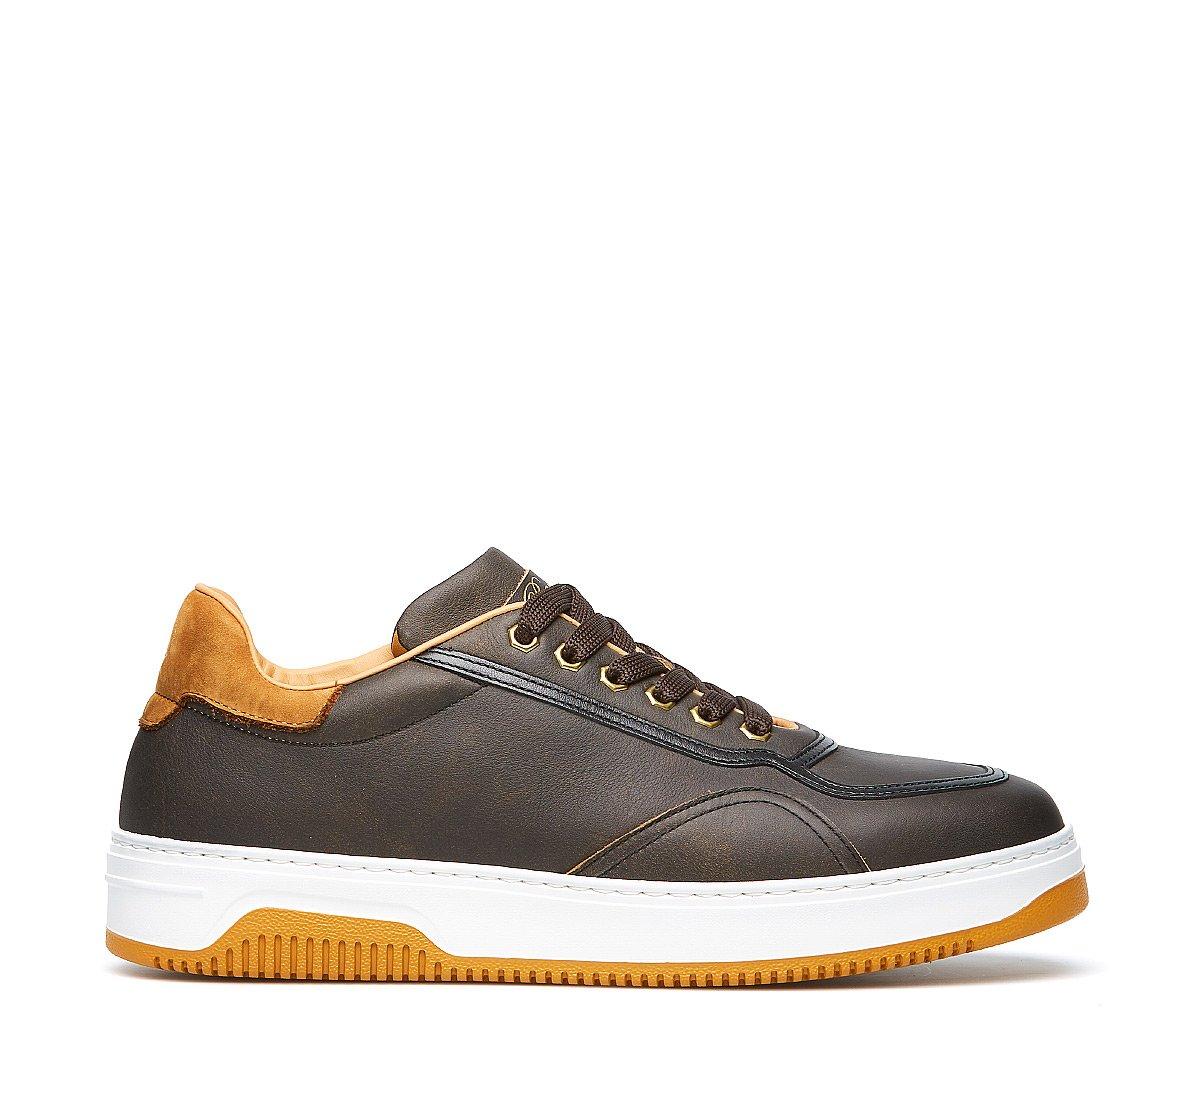 Barracuda Gliese sneakers